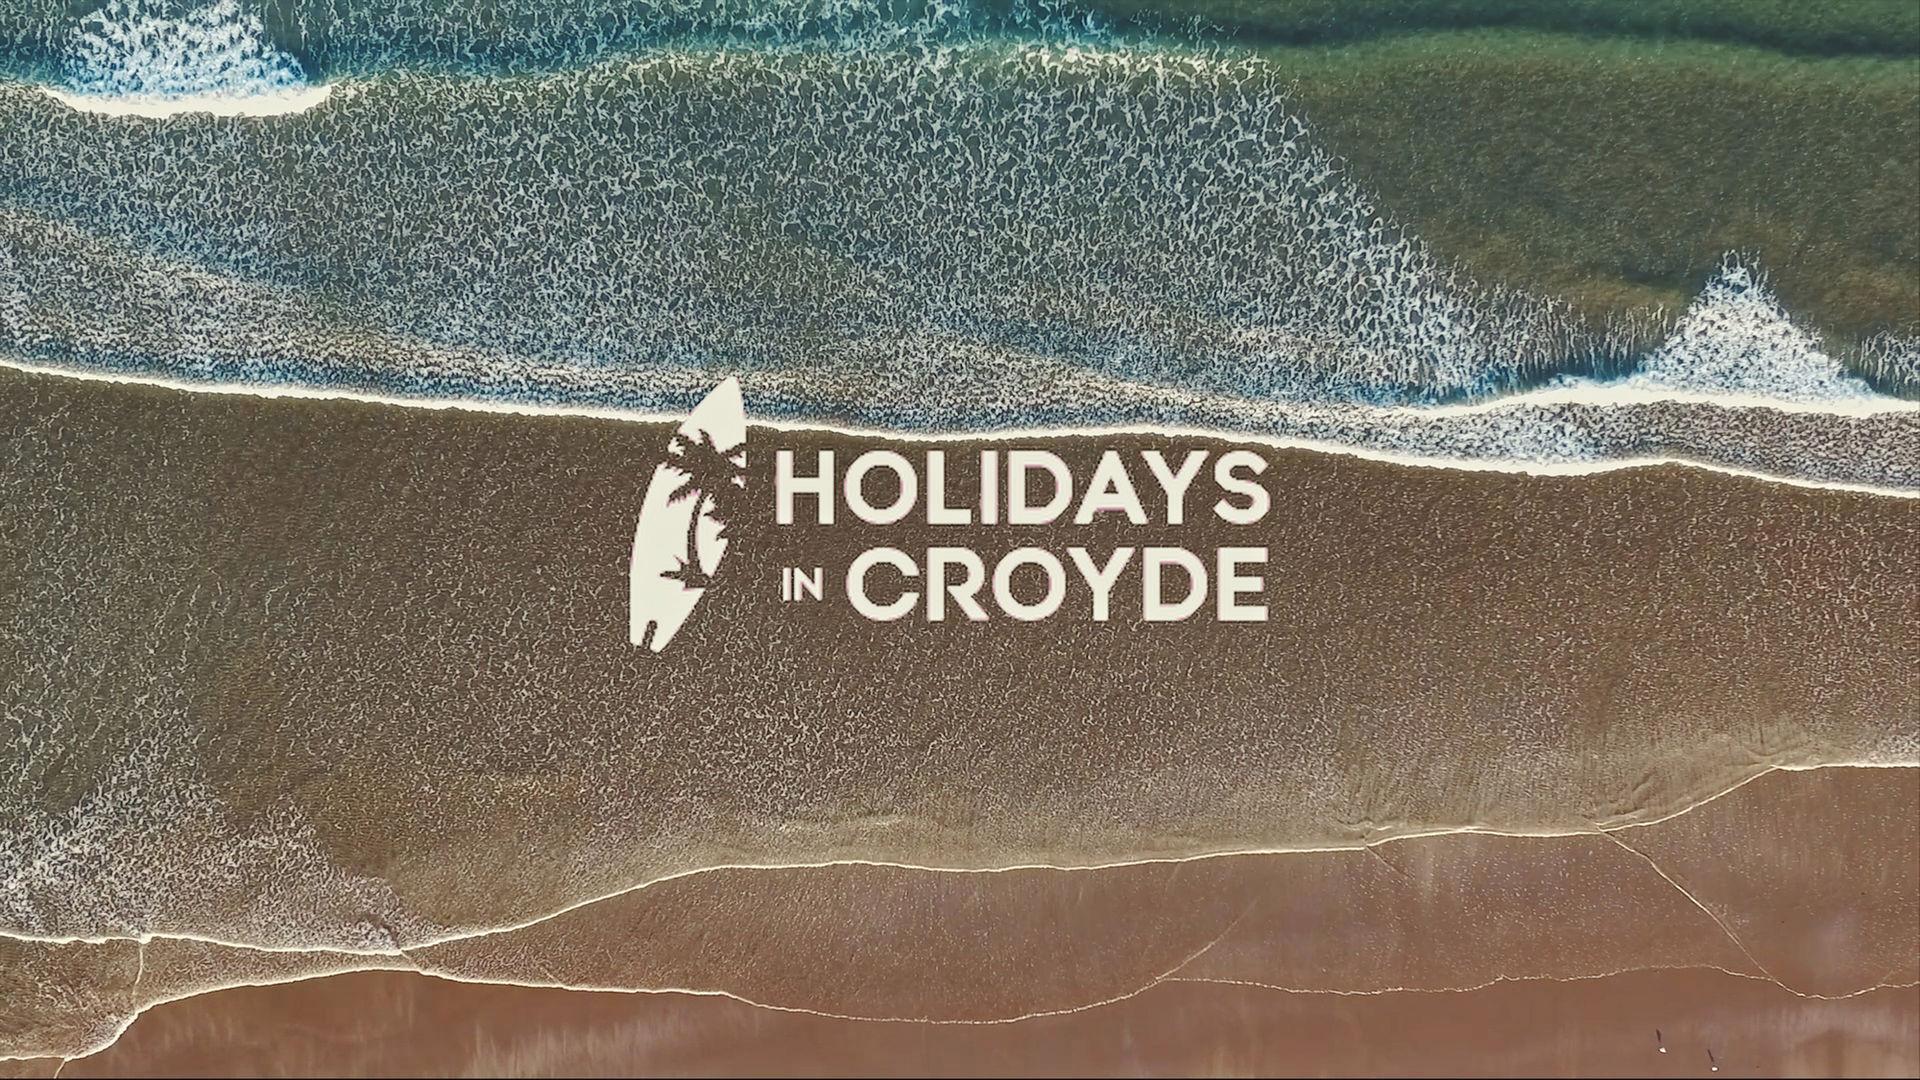 The Rock - HolidaysinCroyde